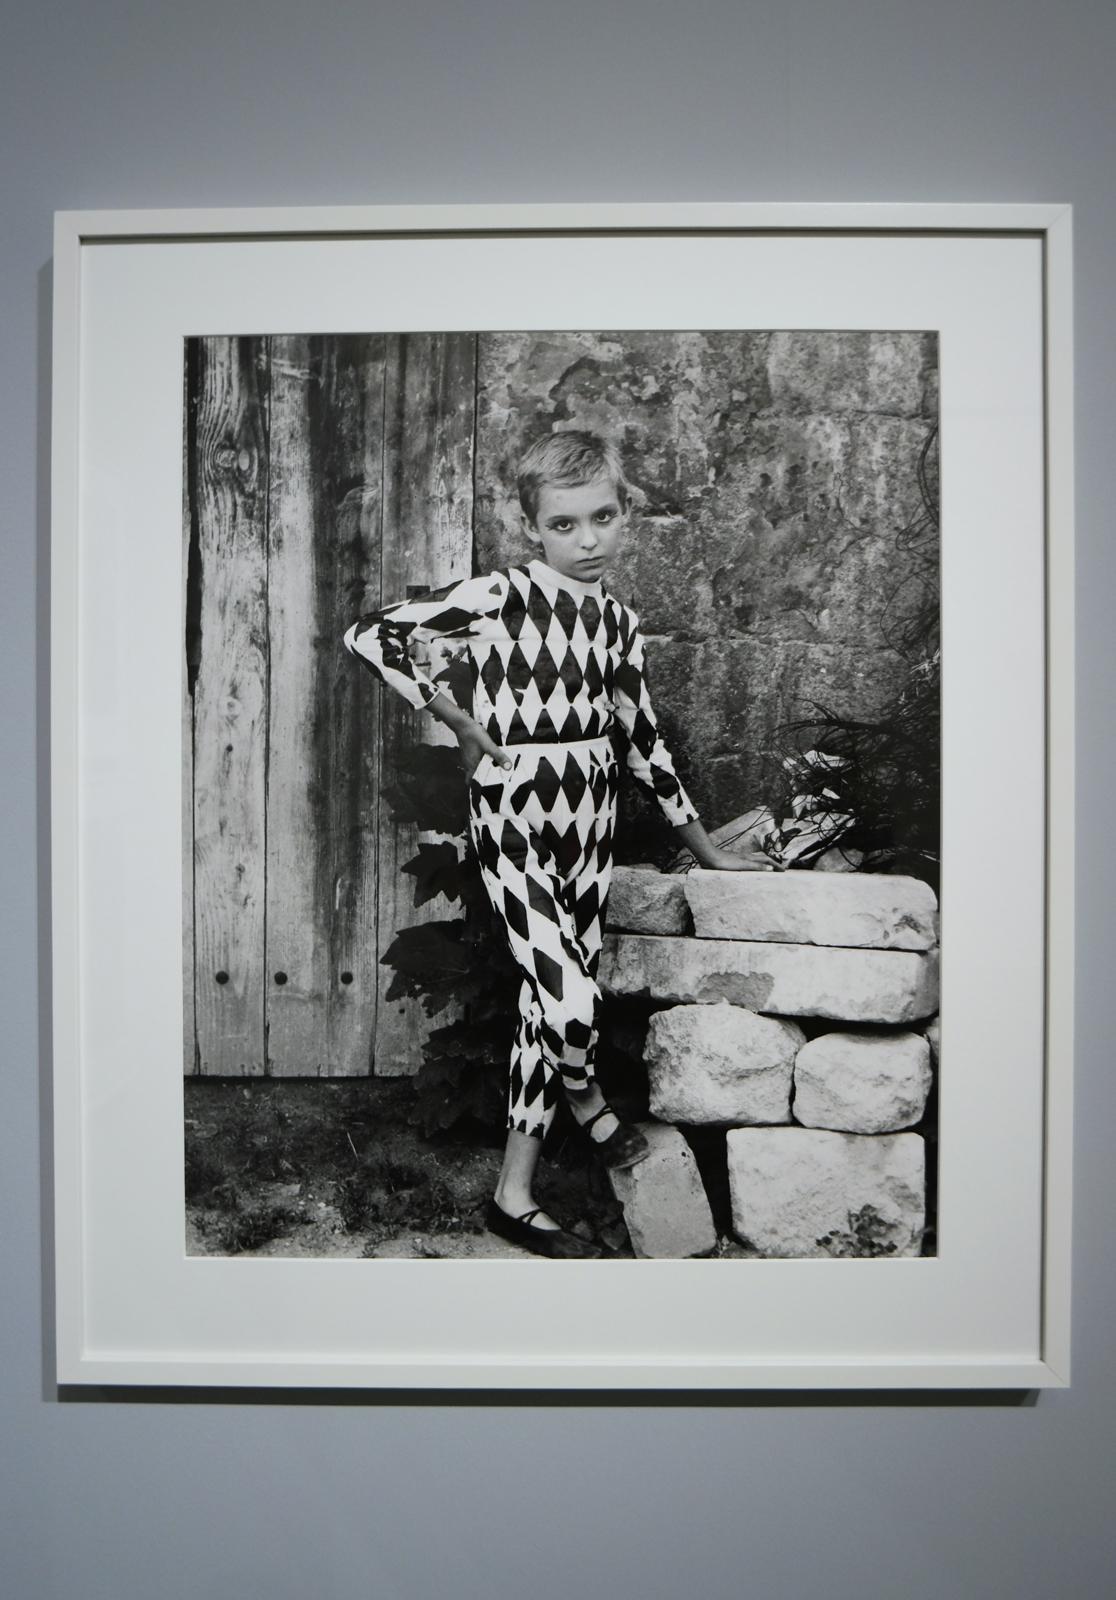 Arlequin, Arles, 1955, Atelier Lucien Clergue